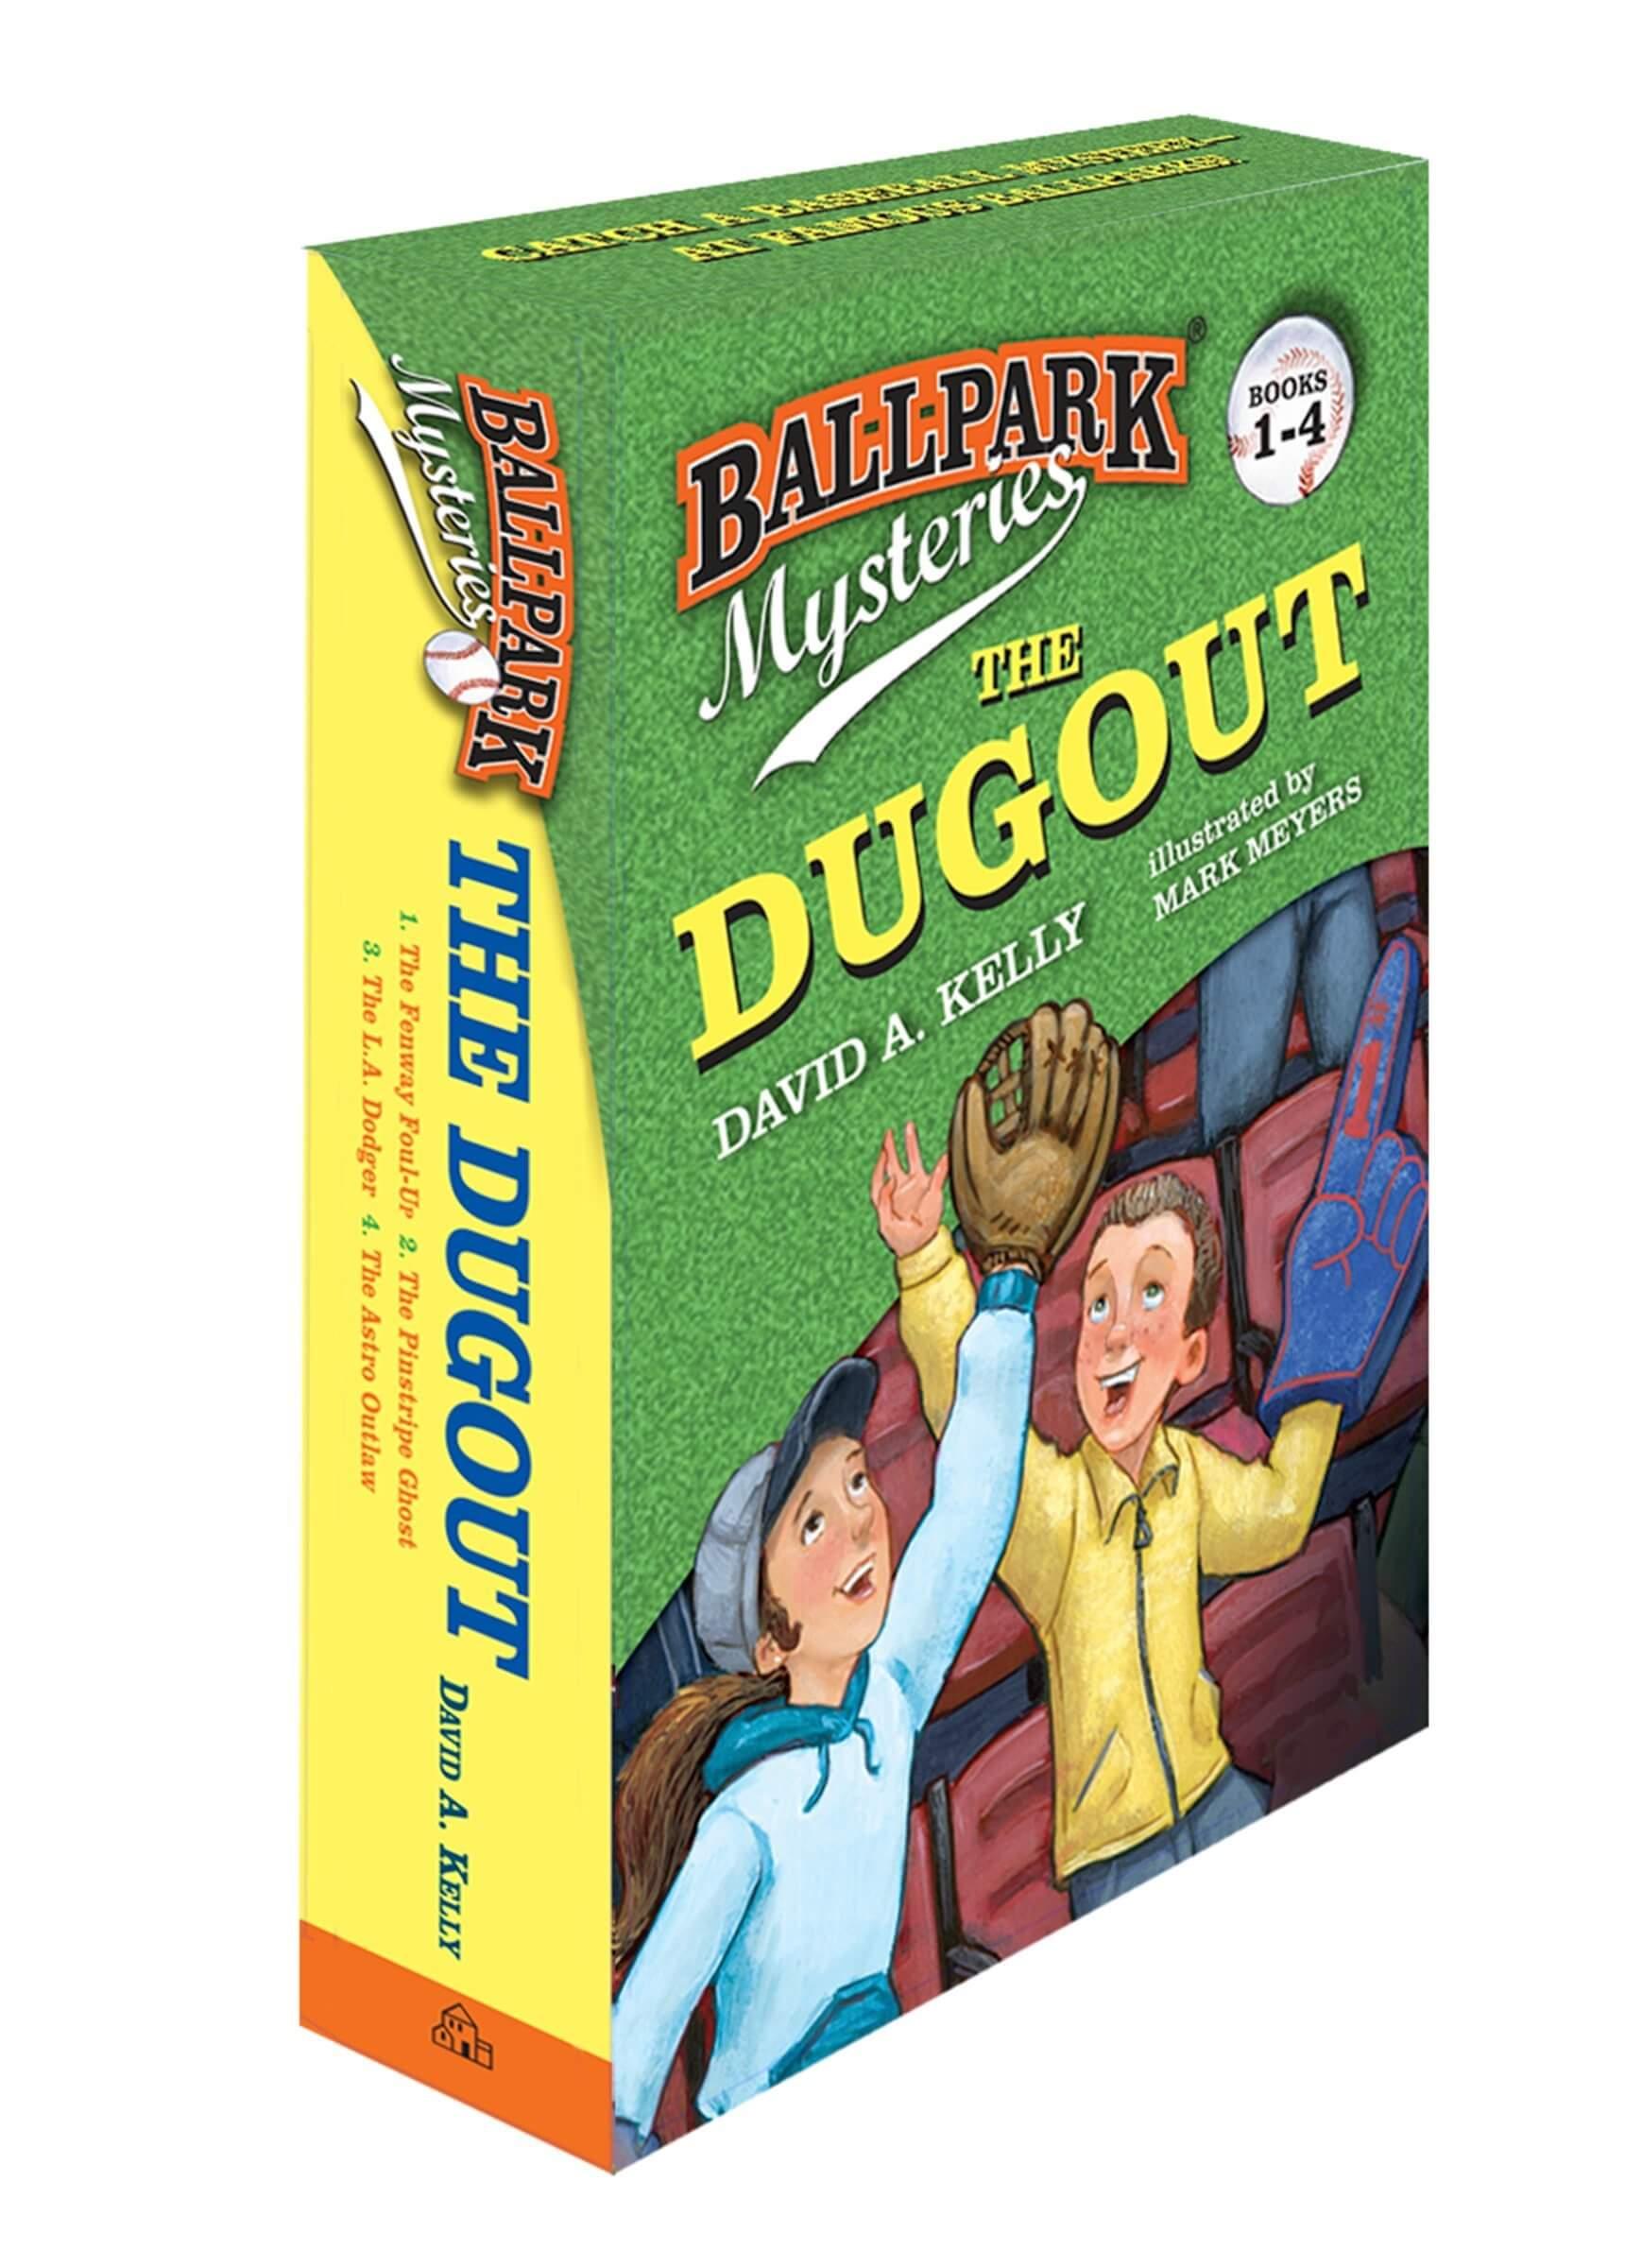 Ballpark Mysteries: The Dugout (books 1-4)